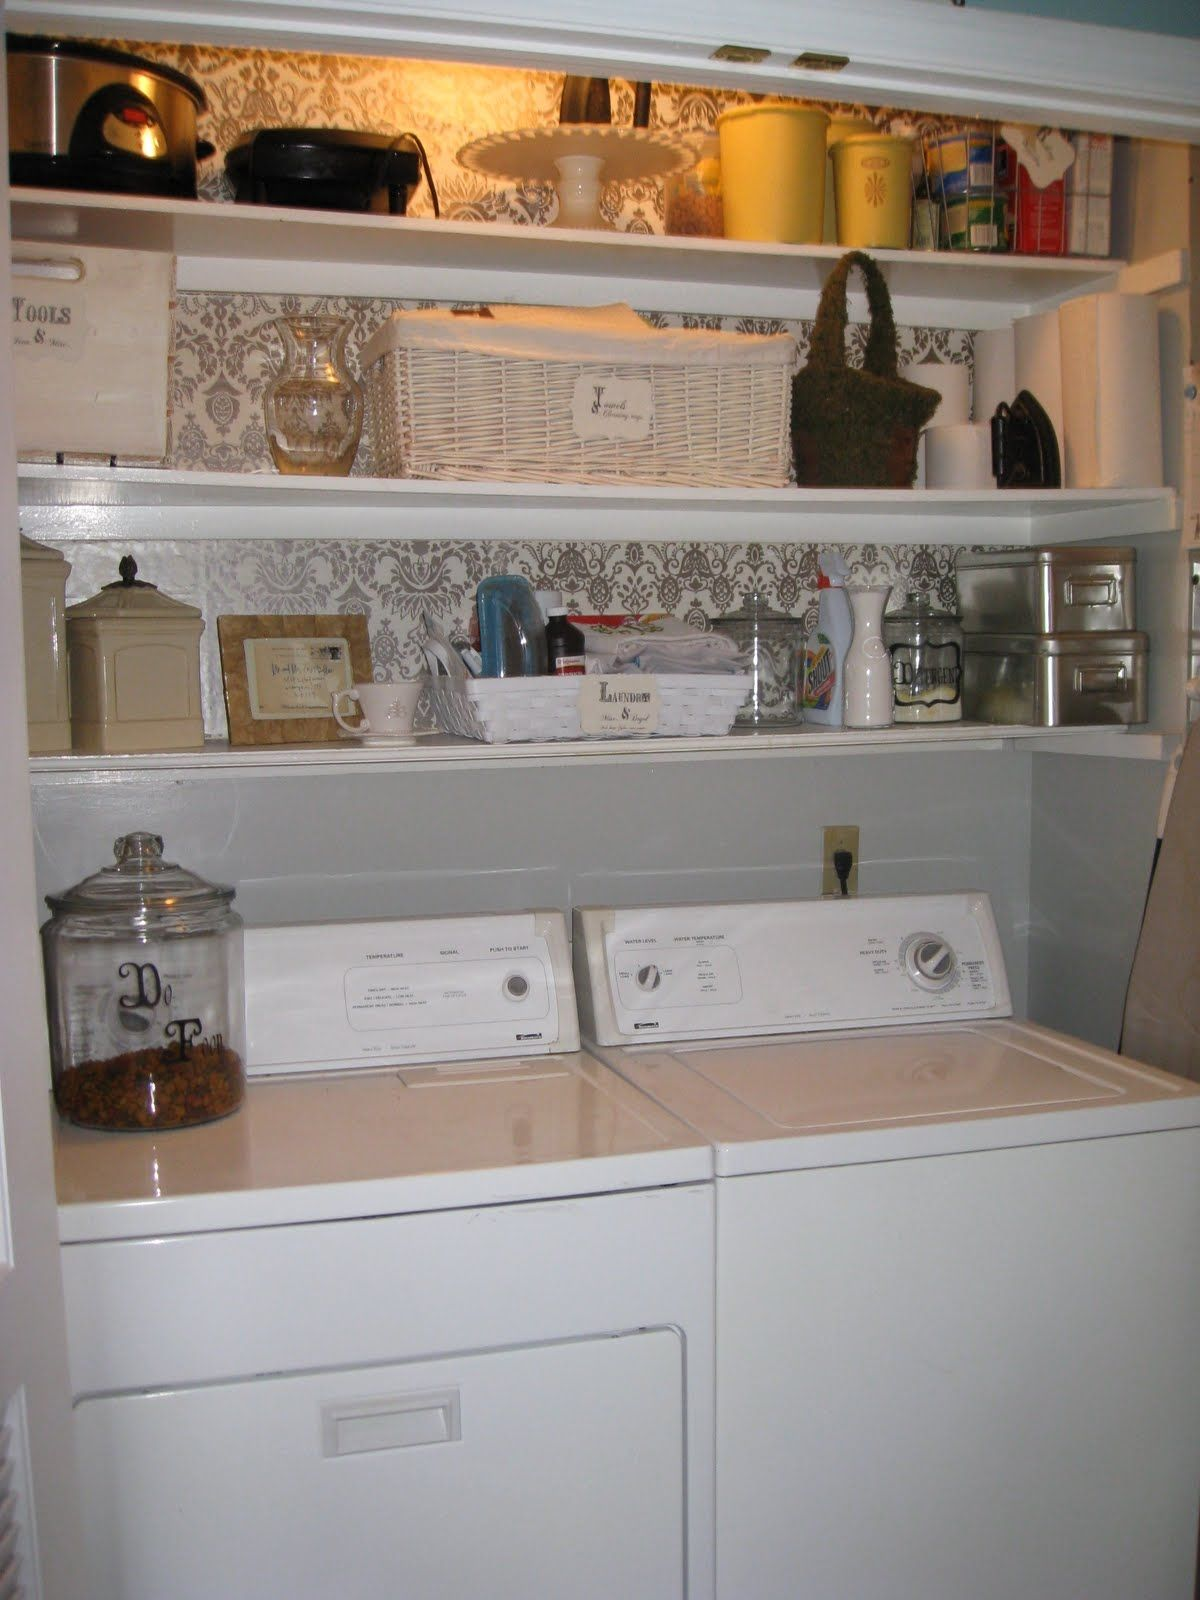 Pin by brandi kizziah on laundry room pinterest laundry room